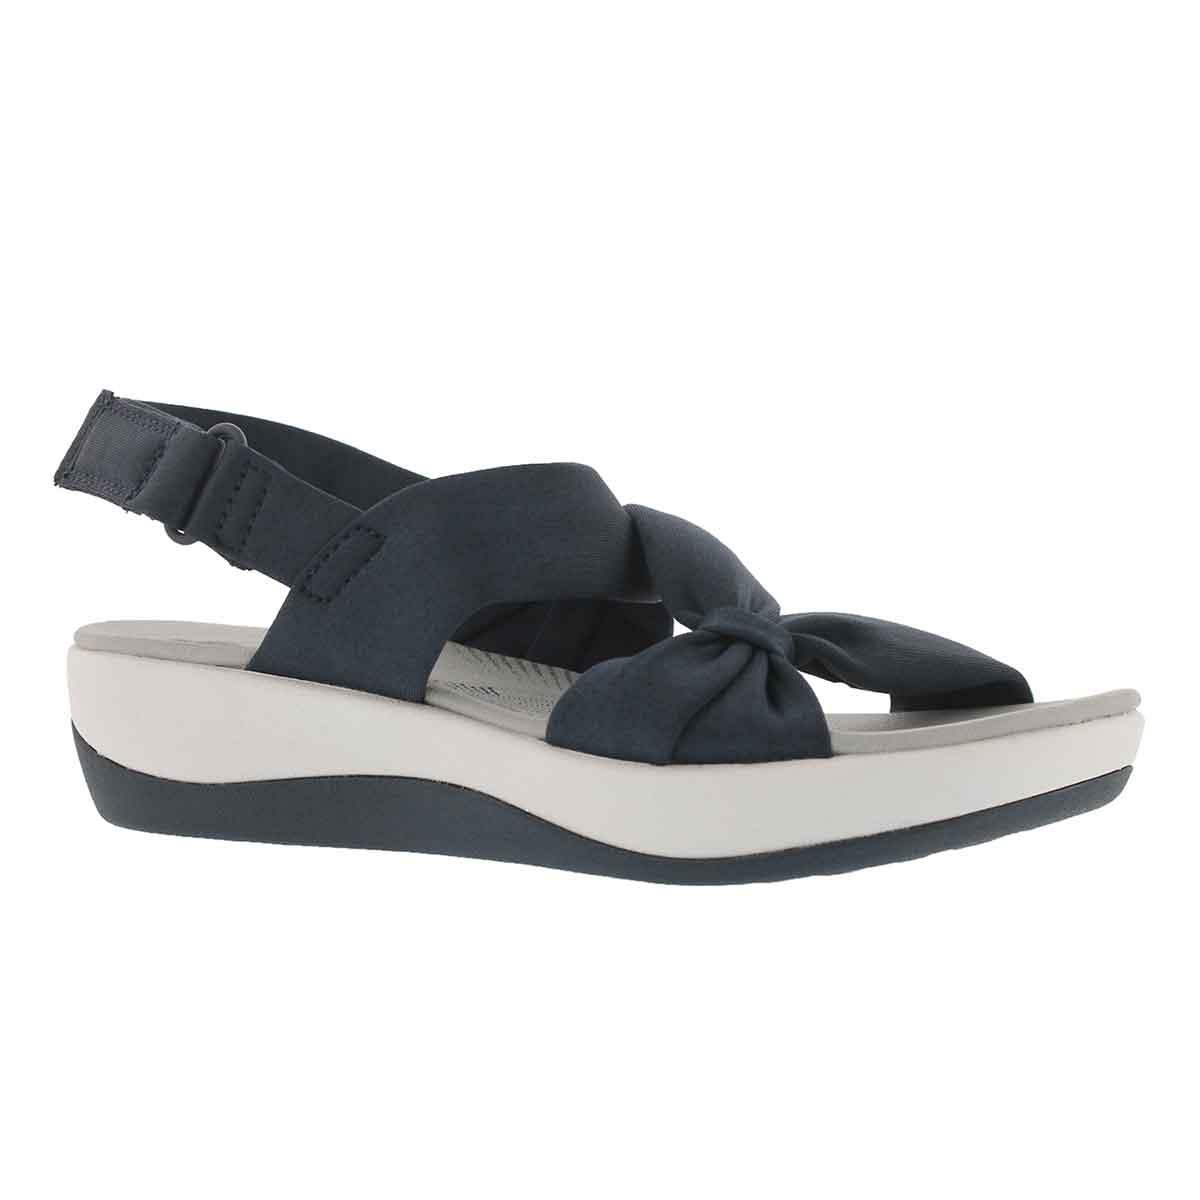 Women's ARLA PRIMROSE blue wedge sandals